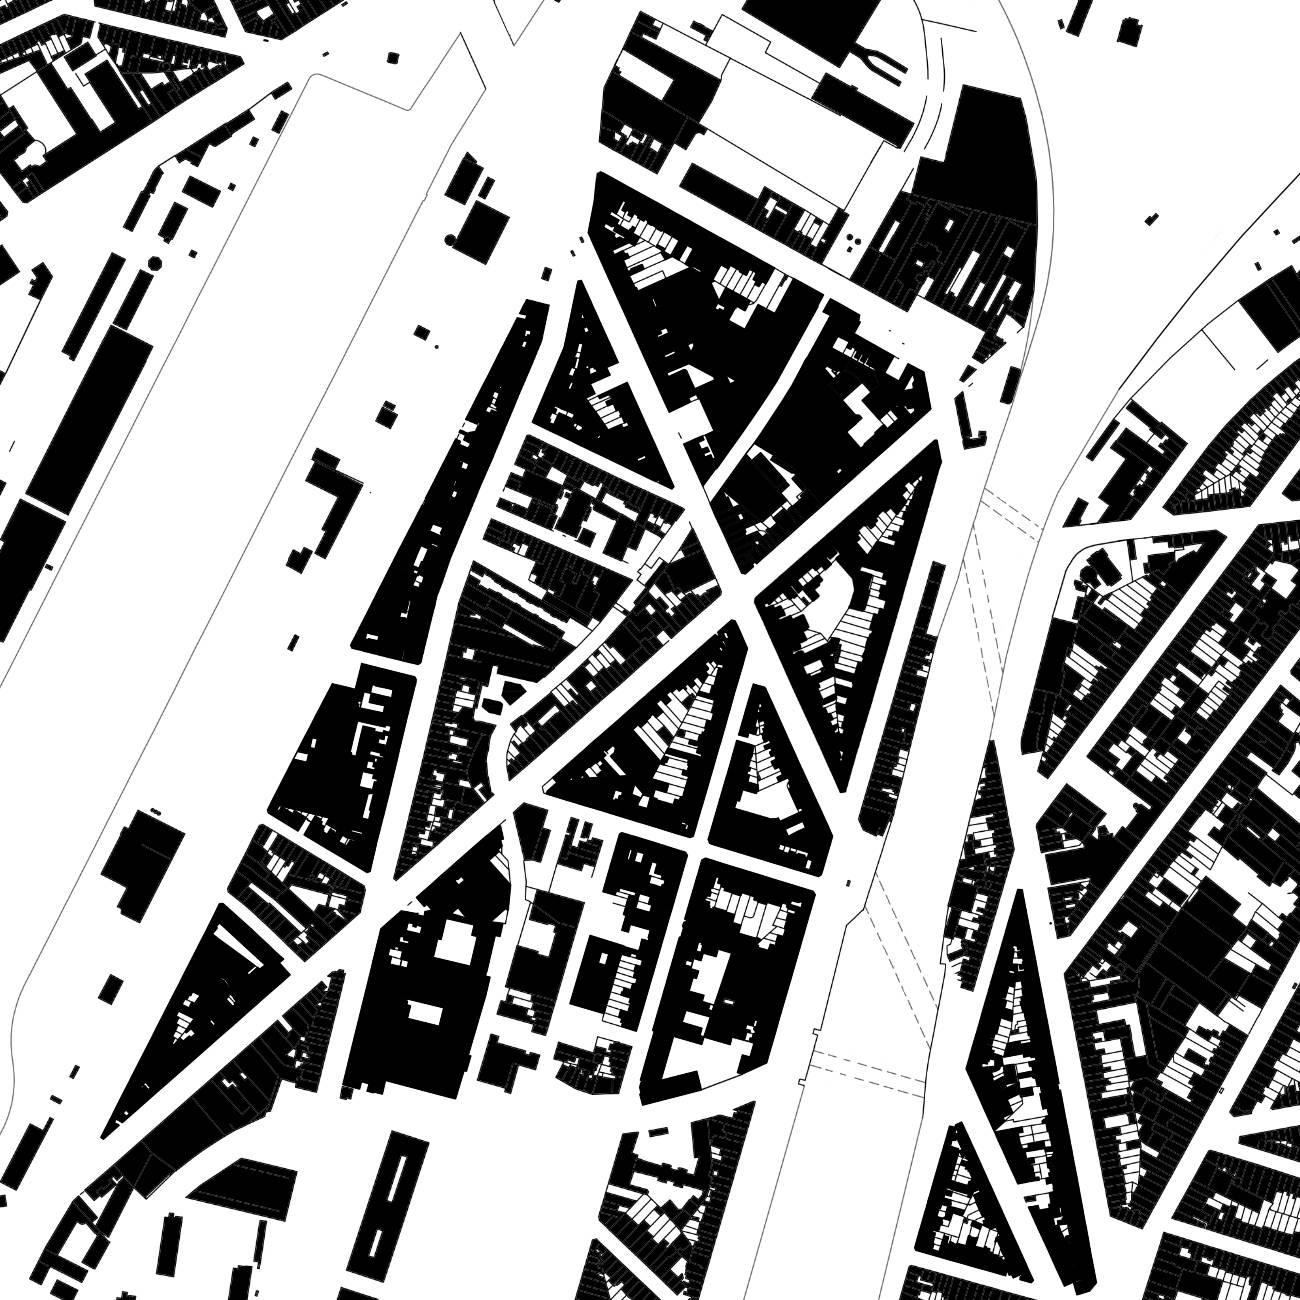 Masui, mixed use, Brussel-1715091491